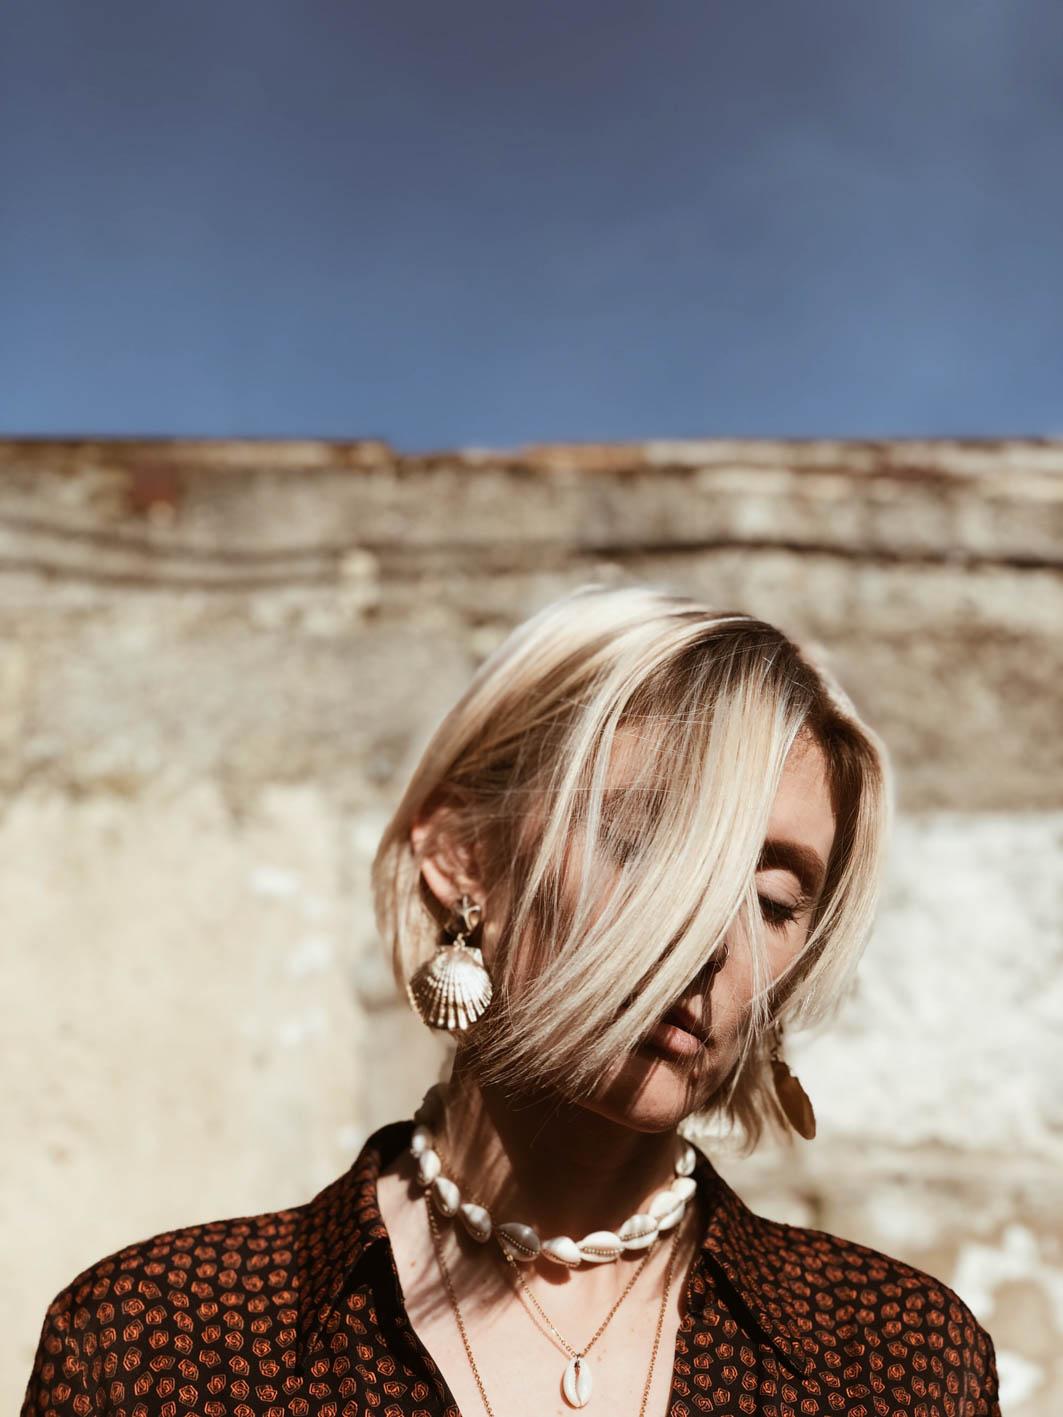 Carnet sauvage- blog mode et tendances - Bijoux coquillages6.jpg